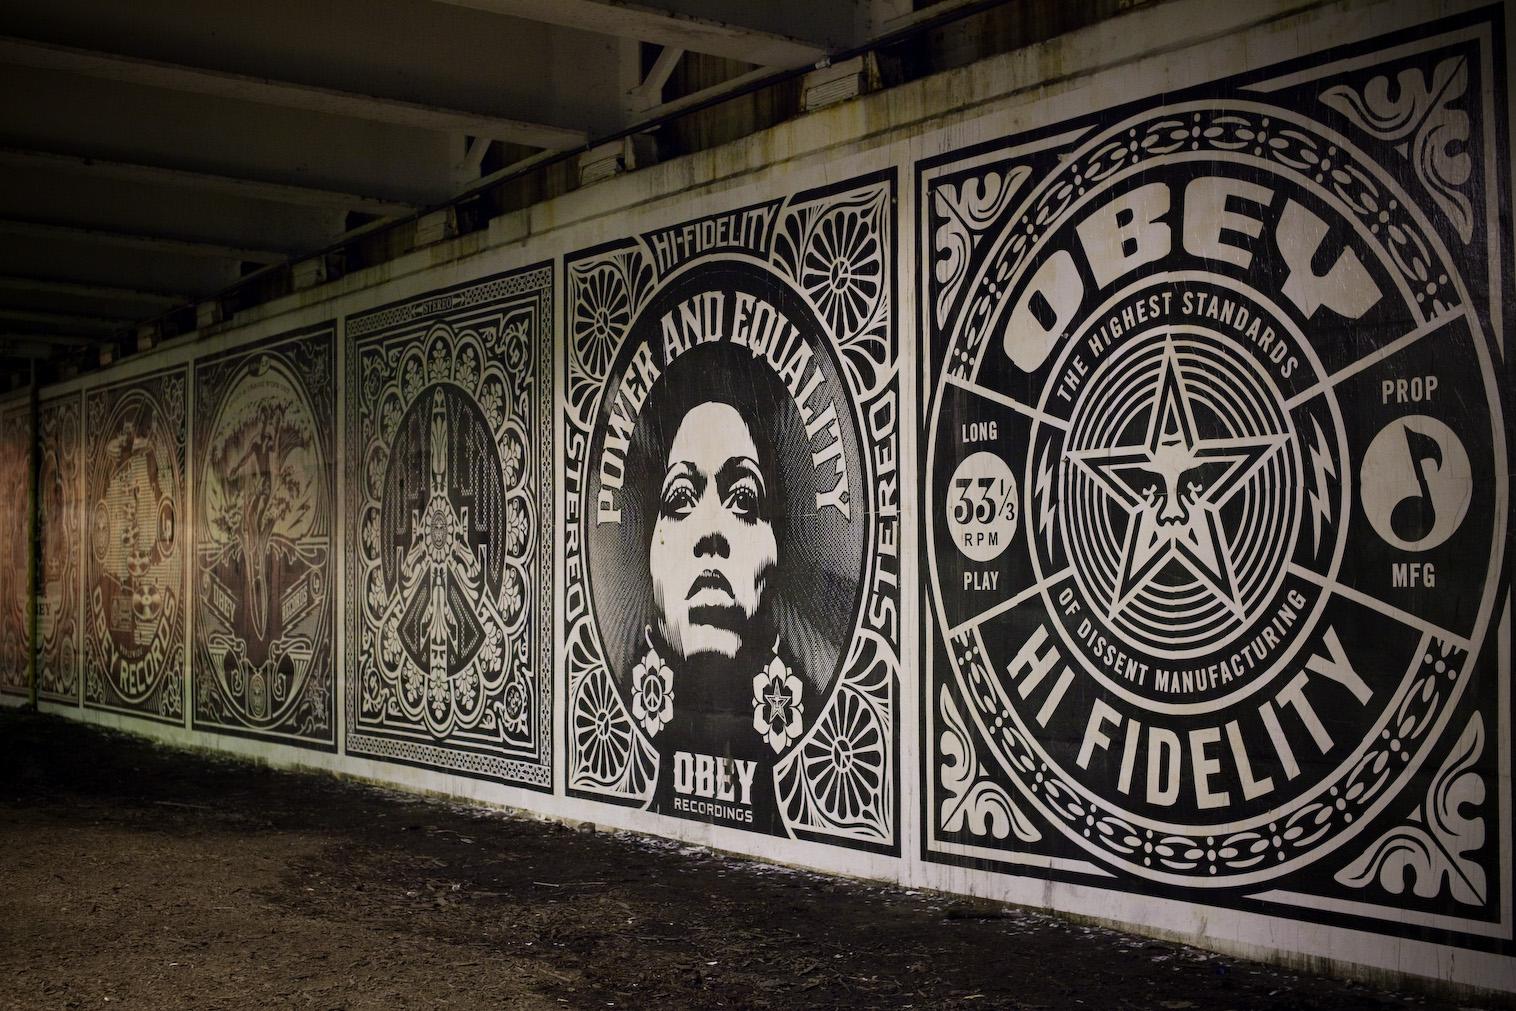 Obey 39 revolutions 39 murals in chicago postersandprints for Chicago mural artist